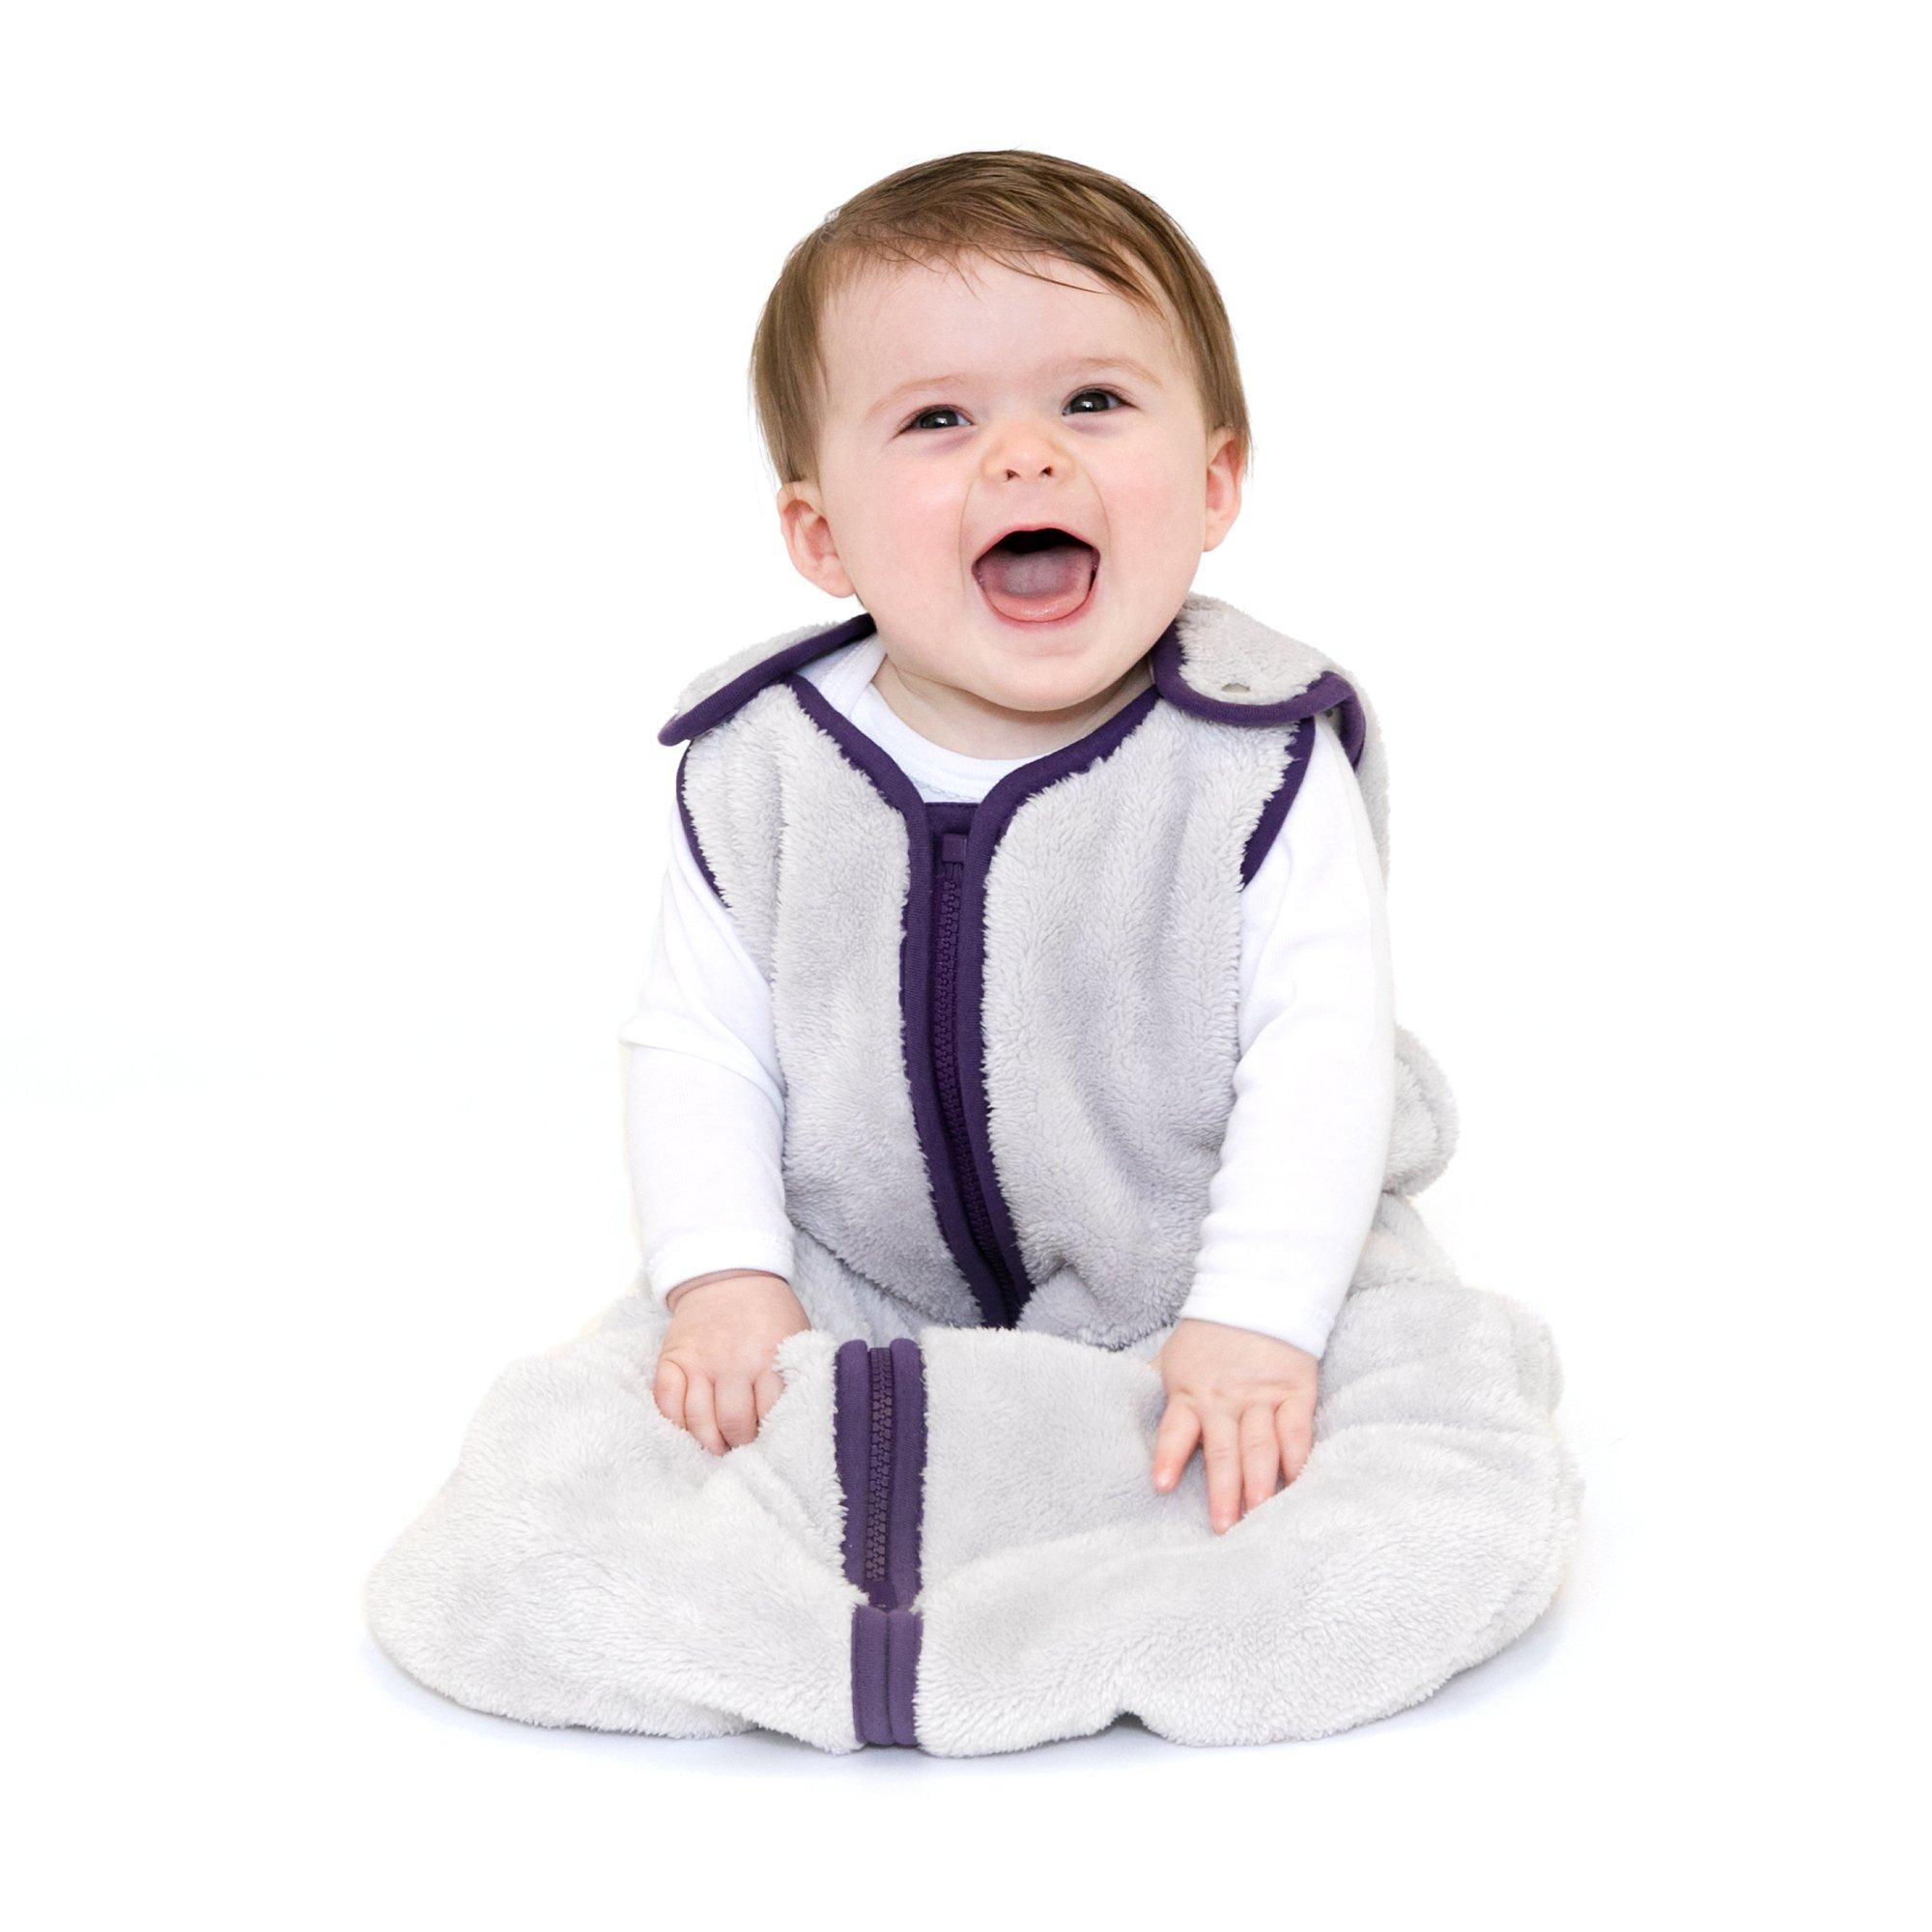 baby deedee Sleep Nest Teddy Baby Sleeping Bag, Silver Plum, Large (18-36 Months)